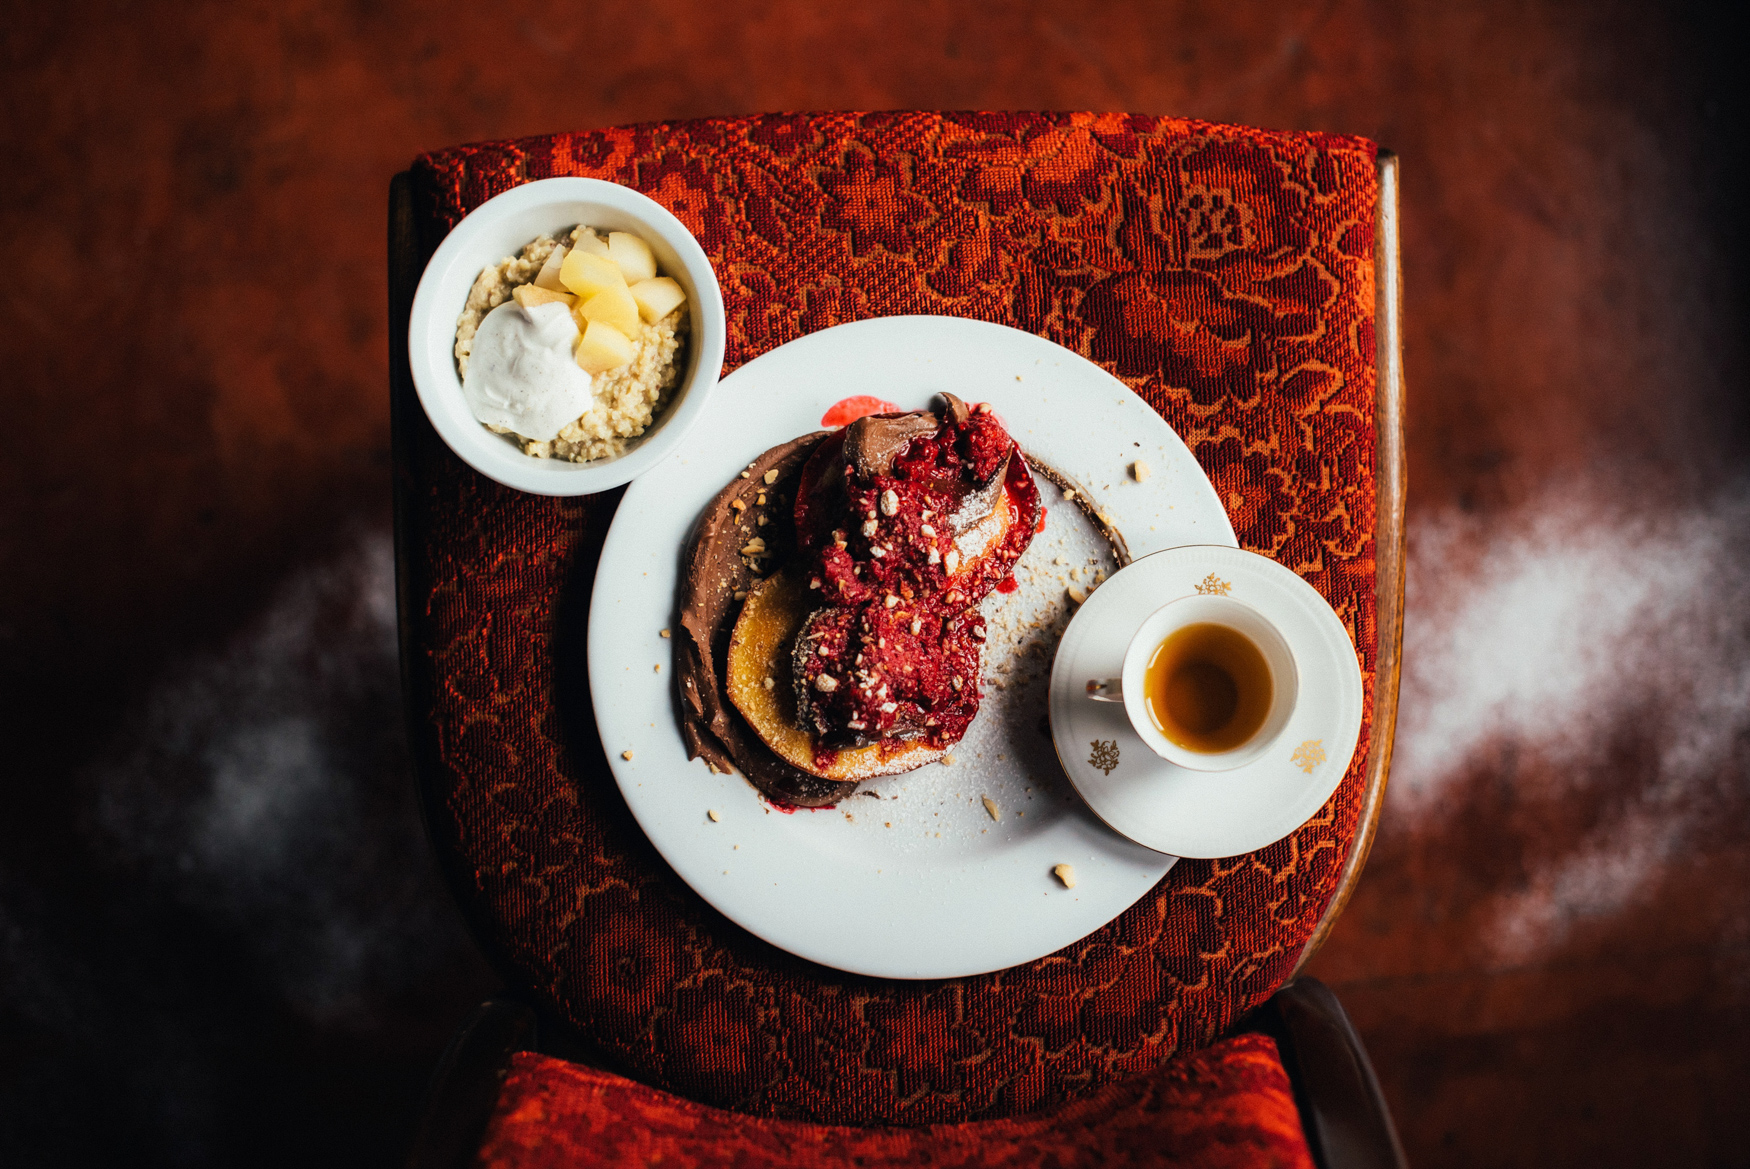 zufana feb2018 editorial food photography 018.jpg